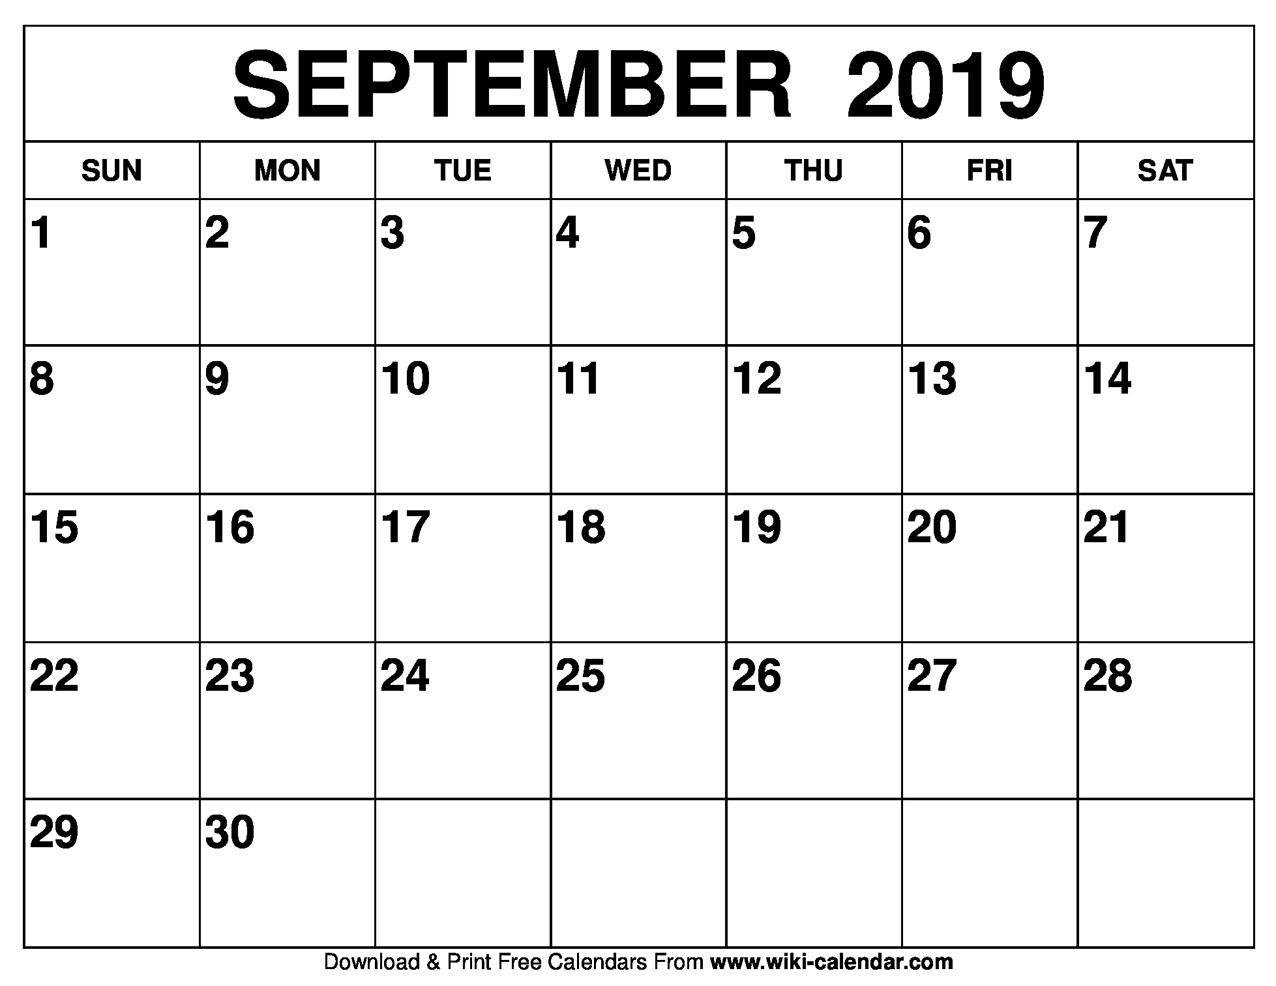 Blank September 2019 Calendar Printable throughout Blank Monthly Calendar September